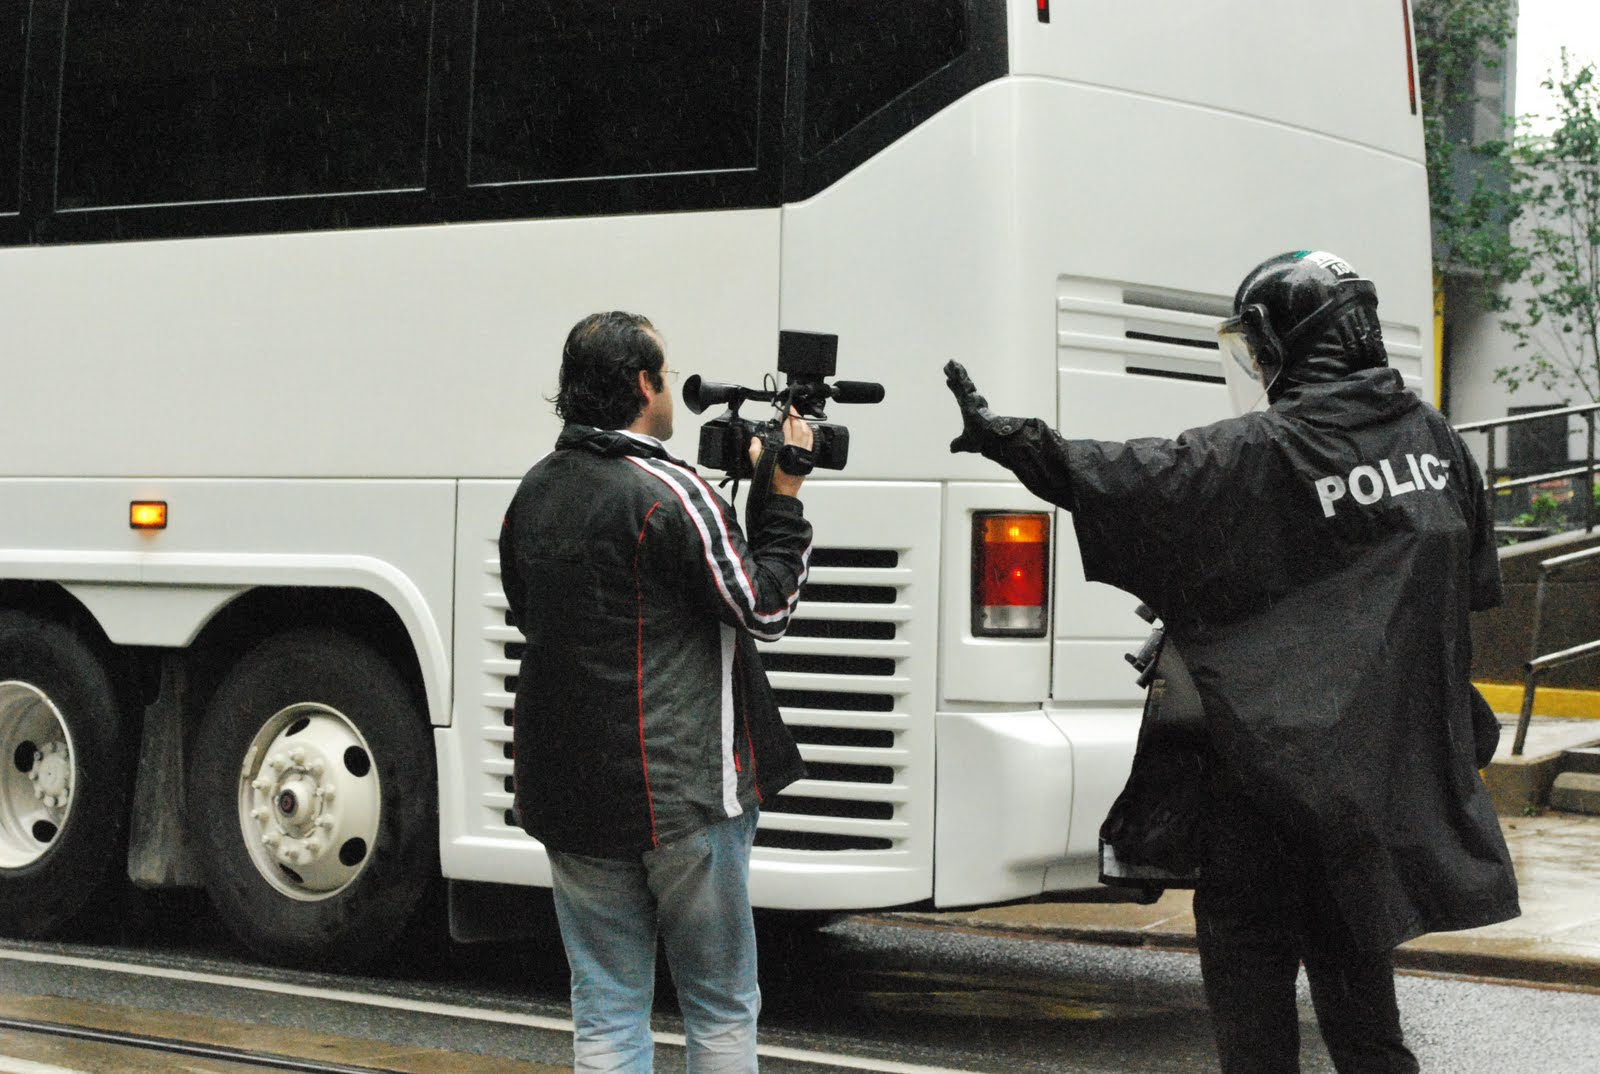 http://www.activistpost.com/wp-content/uploads/2016/02/tabrizi-police.jpg